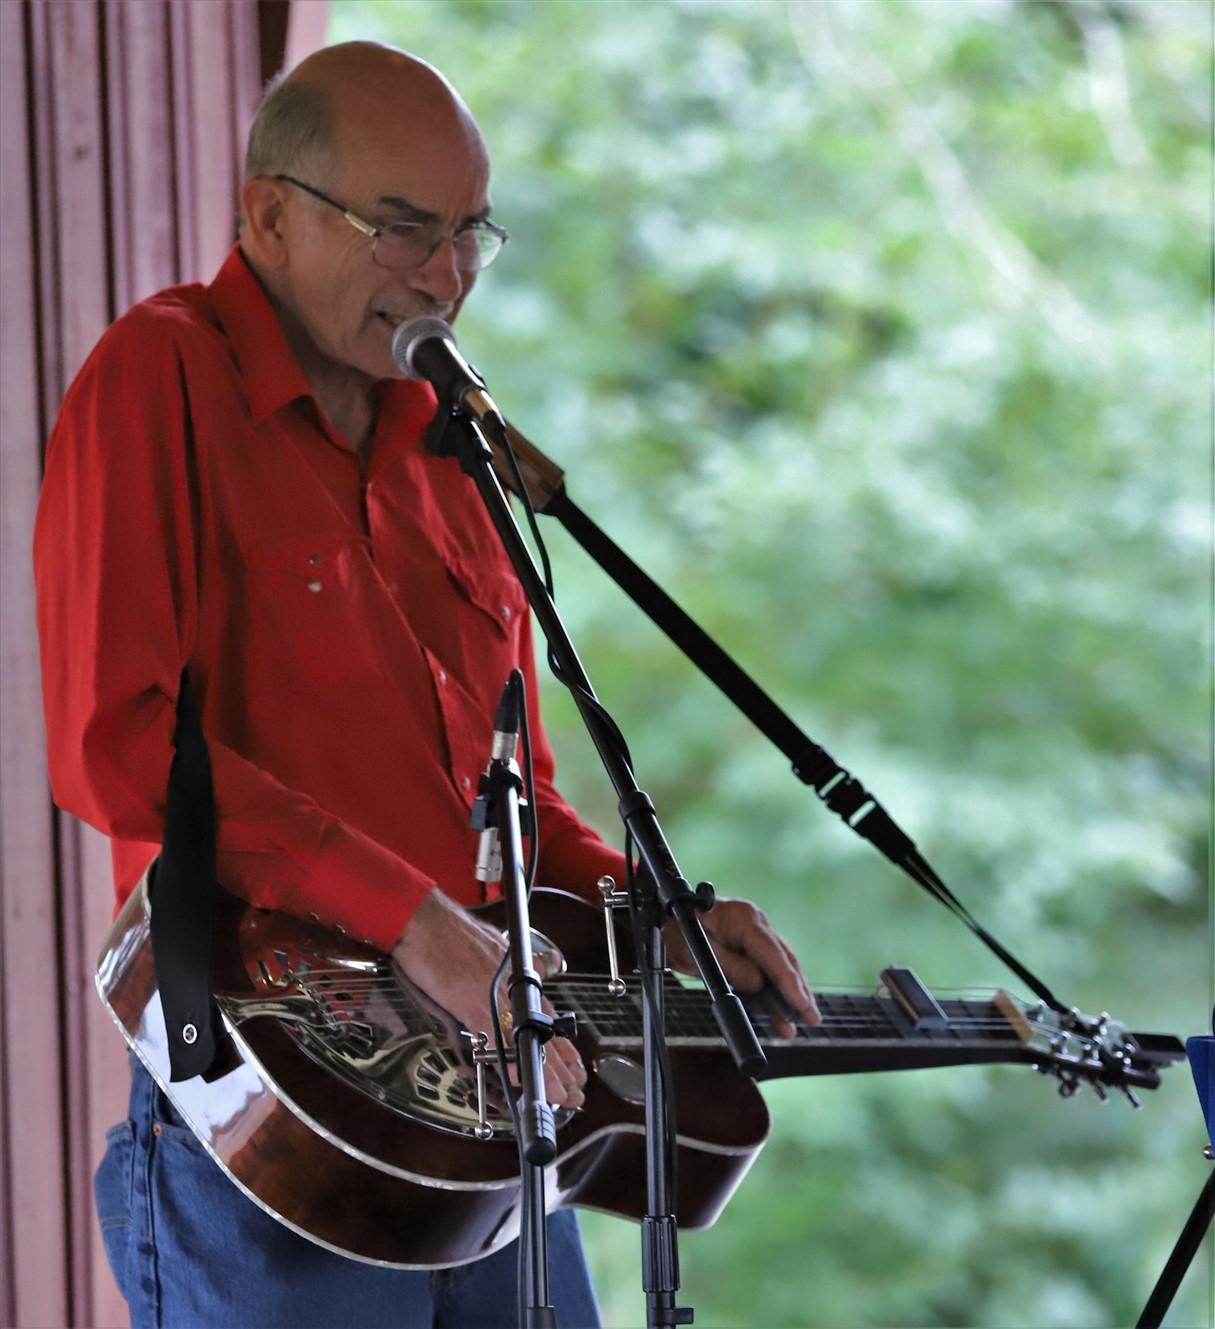 2018 09 22 355 Marysville OH Bluegrass Festival.jpg